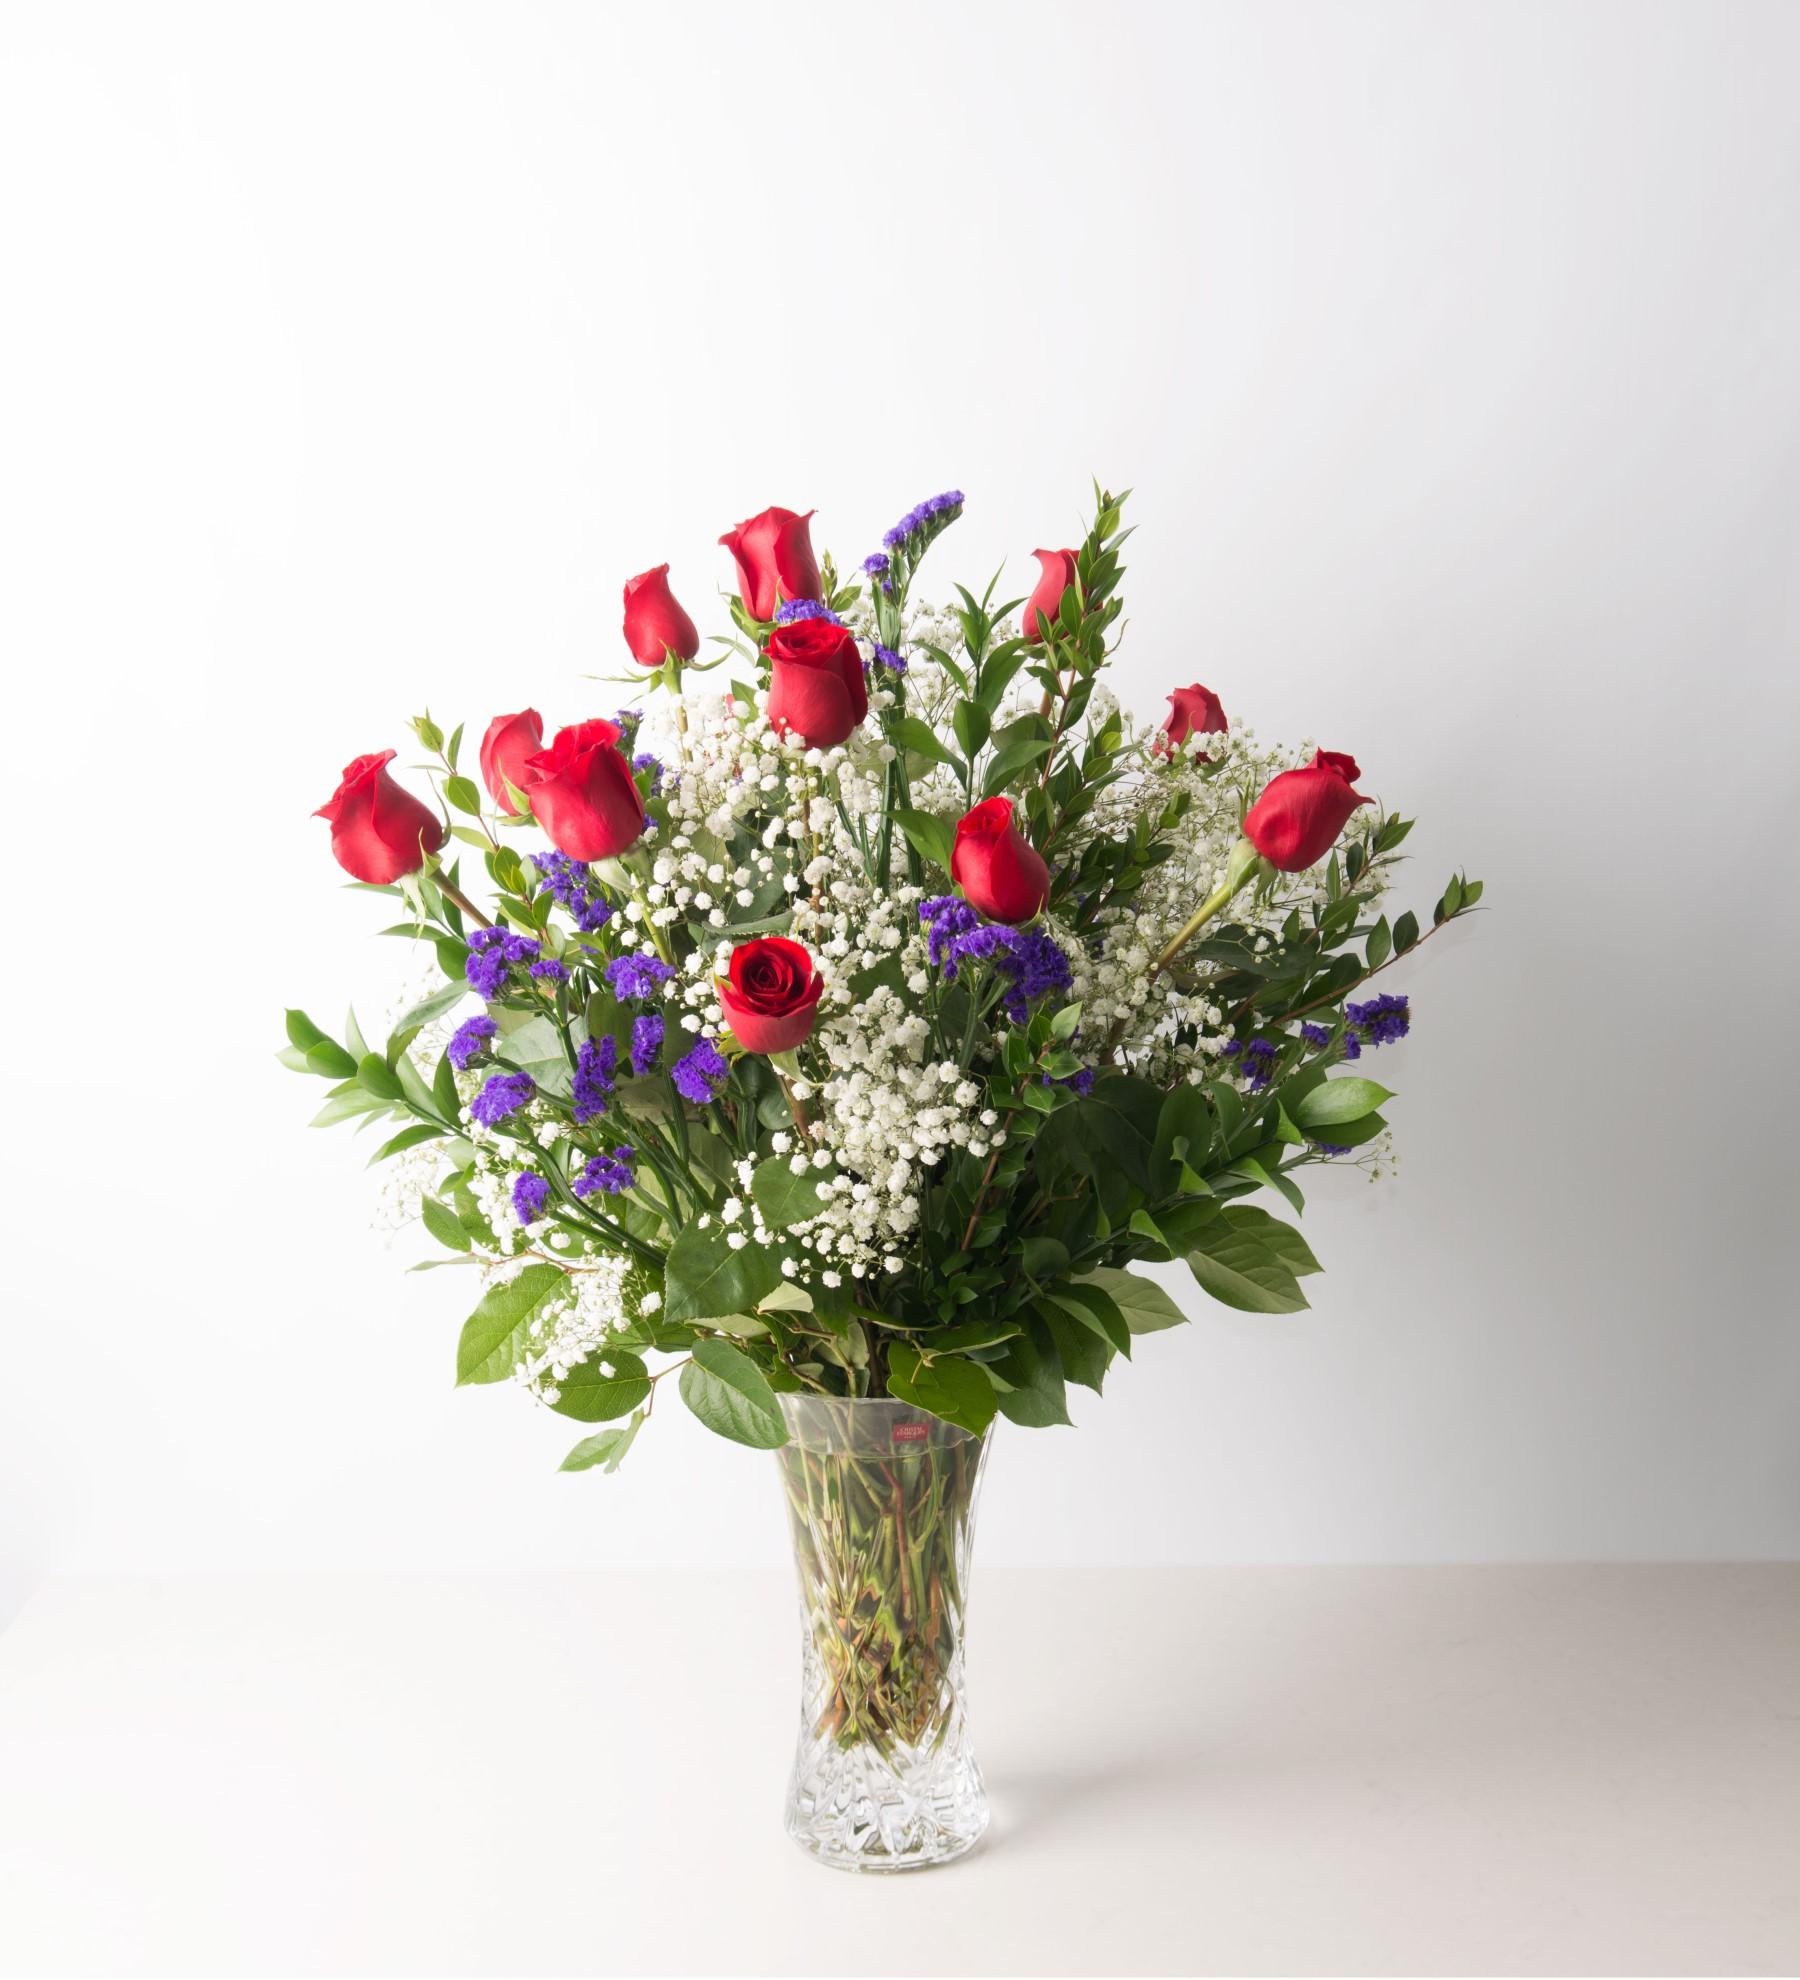 Ultimate Dozen Red Roses in Crystal Vase - Luxe Line - Bartz Viviano ...